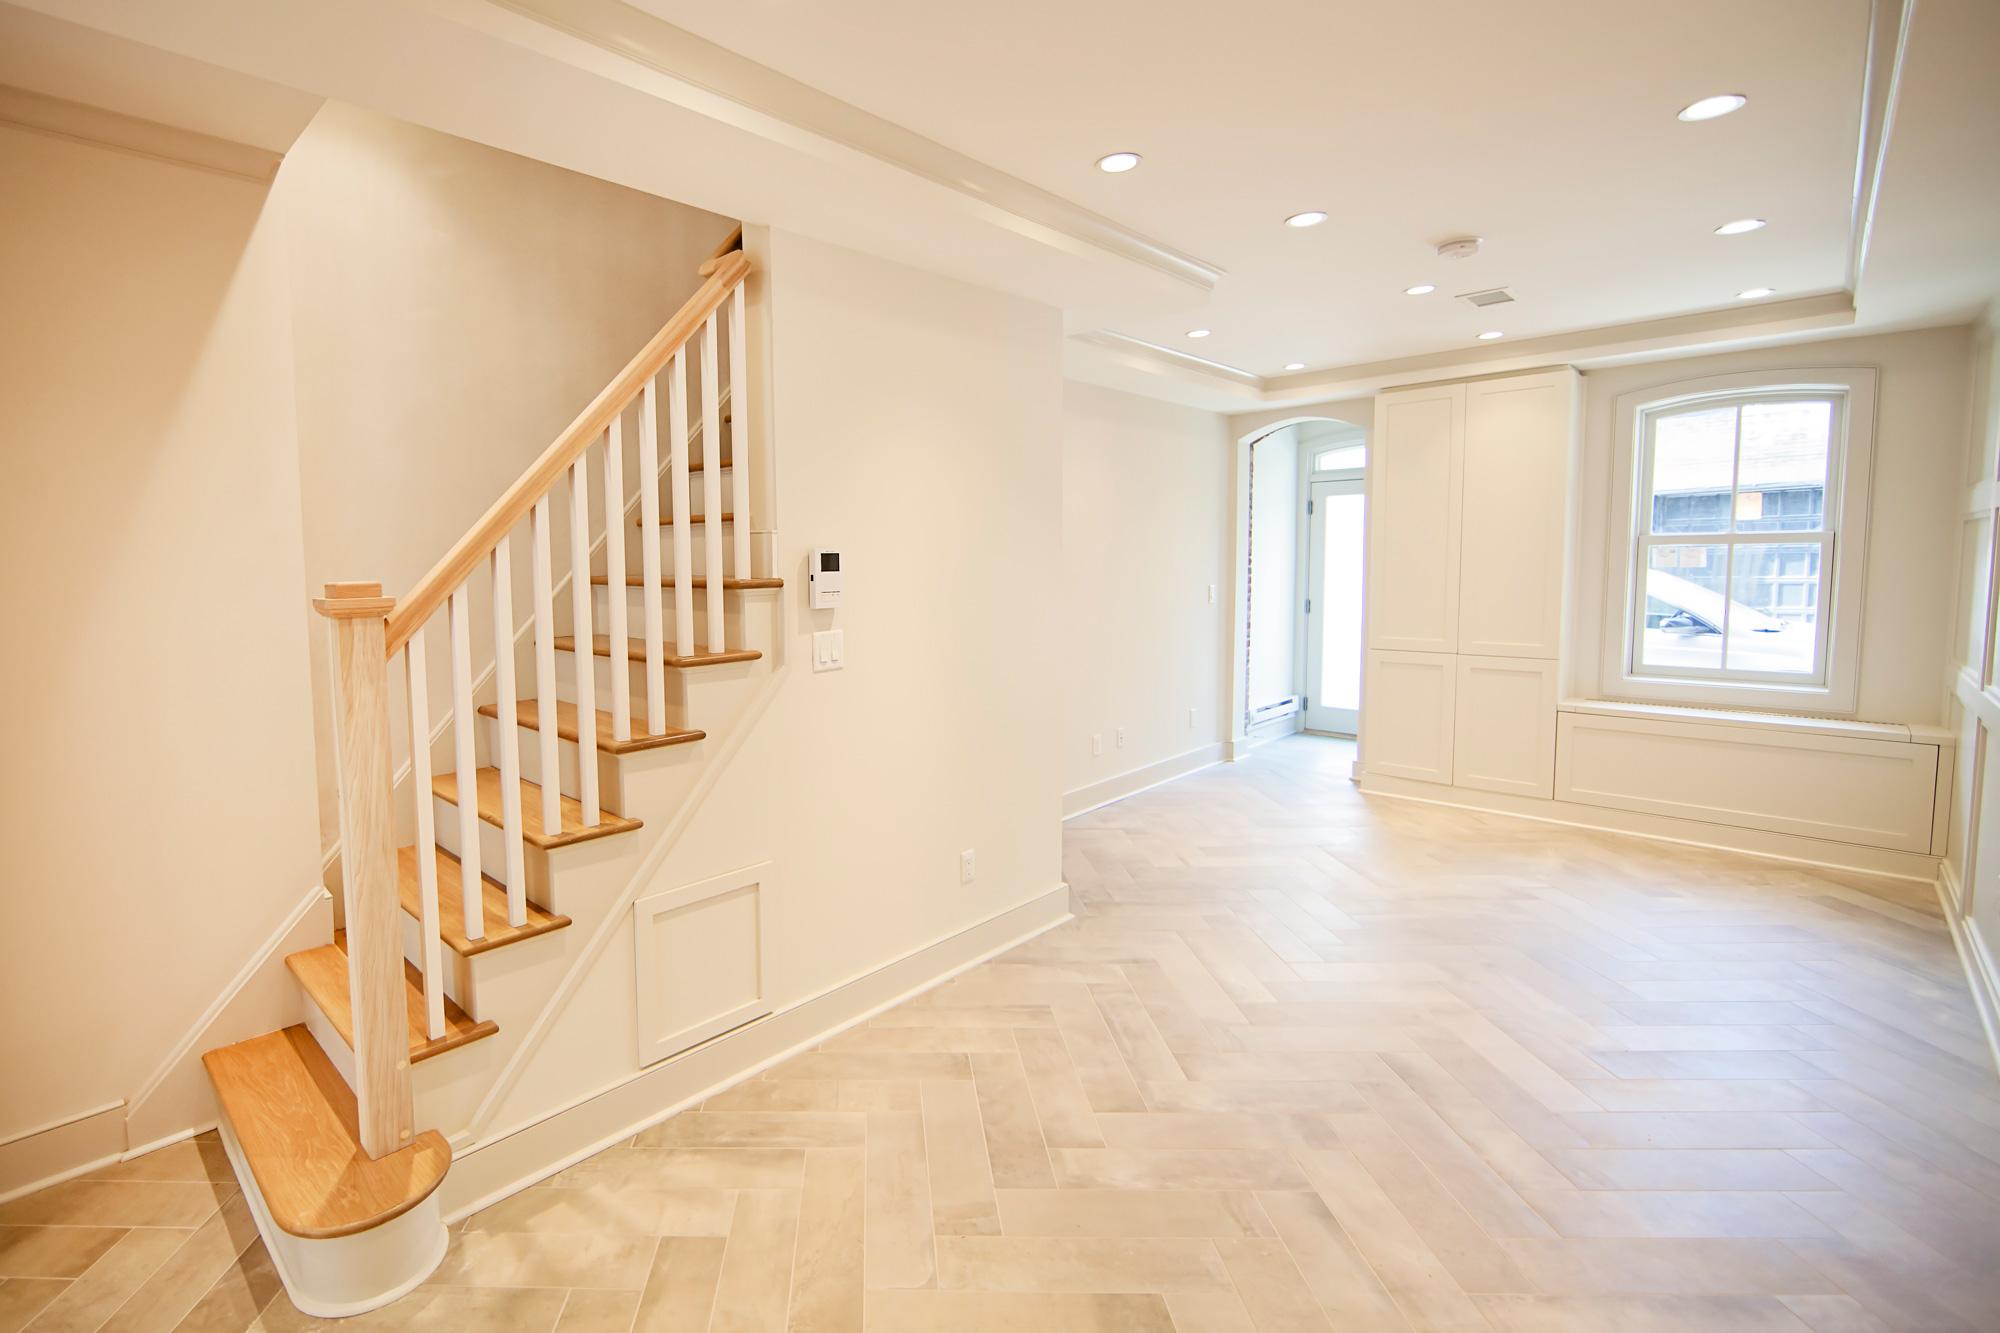 thompson-fine-home-renovations-hoboken-new-jersey-construction-3.jpg